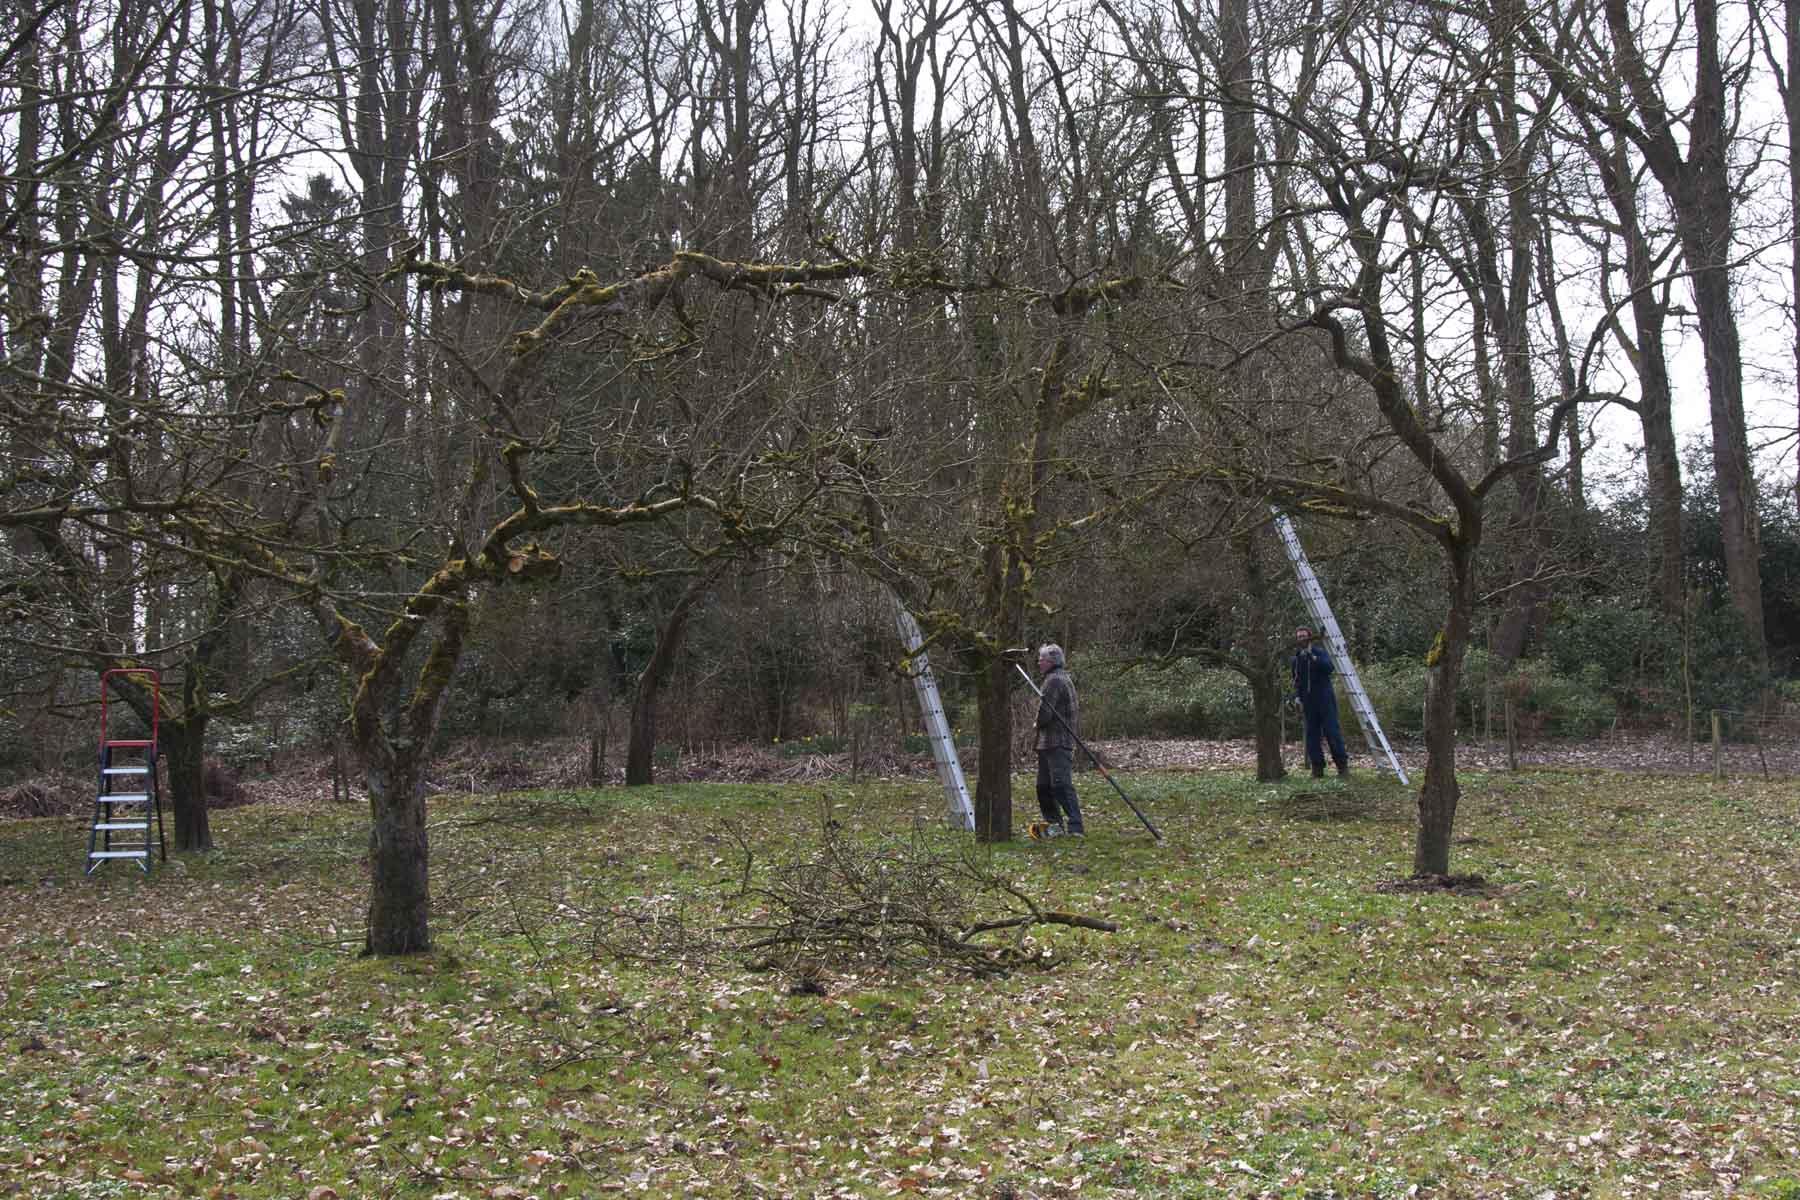 2011-03-26-hsb-vollenhove-2799